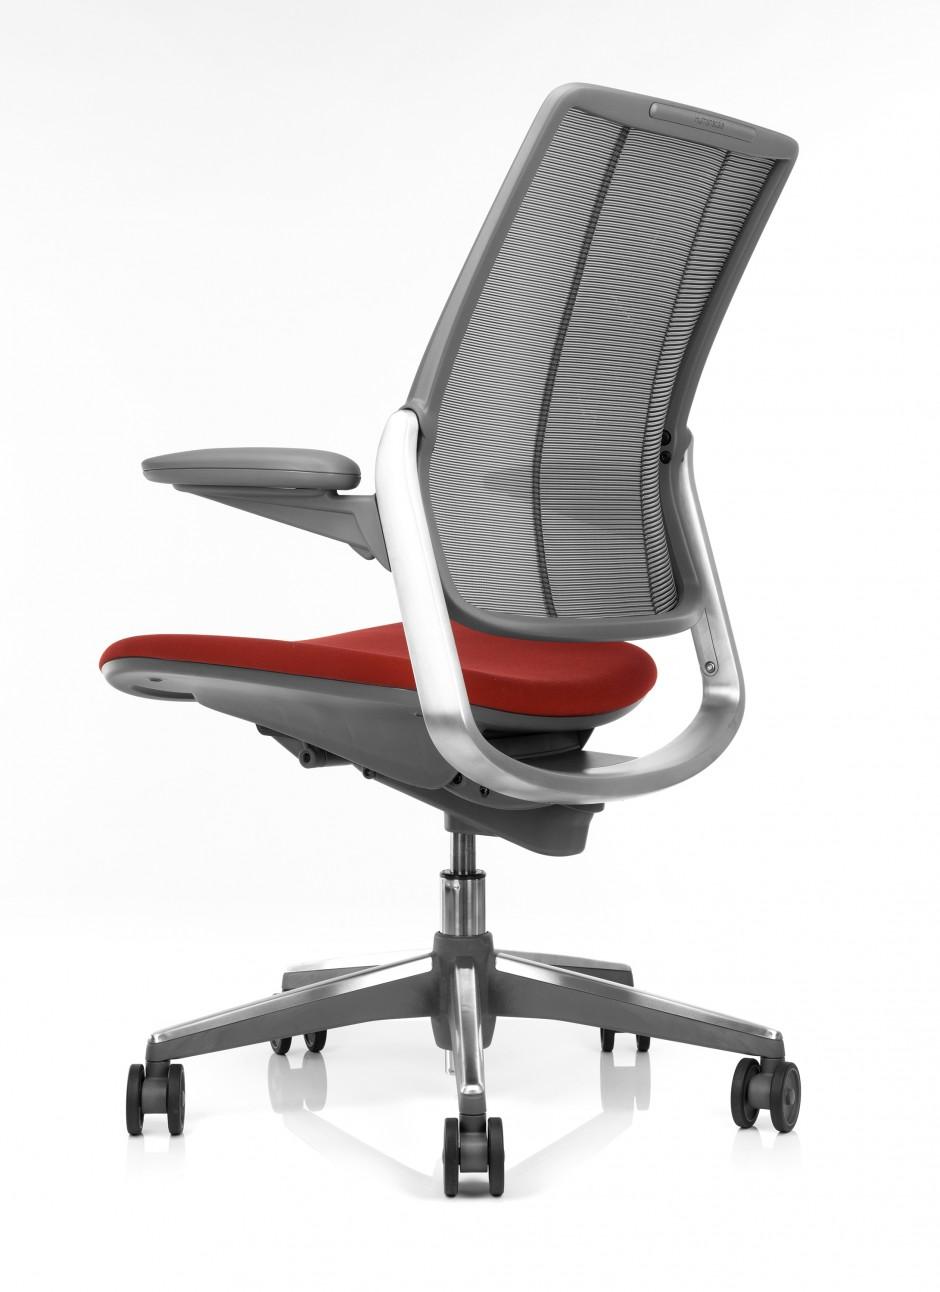 Humanscale Freedom Chair | Humanscale Freedom Chair Replacement Parts | Human Scale Freedom Chair